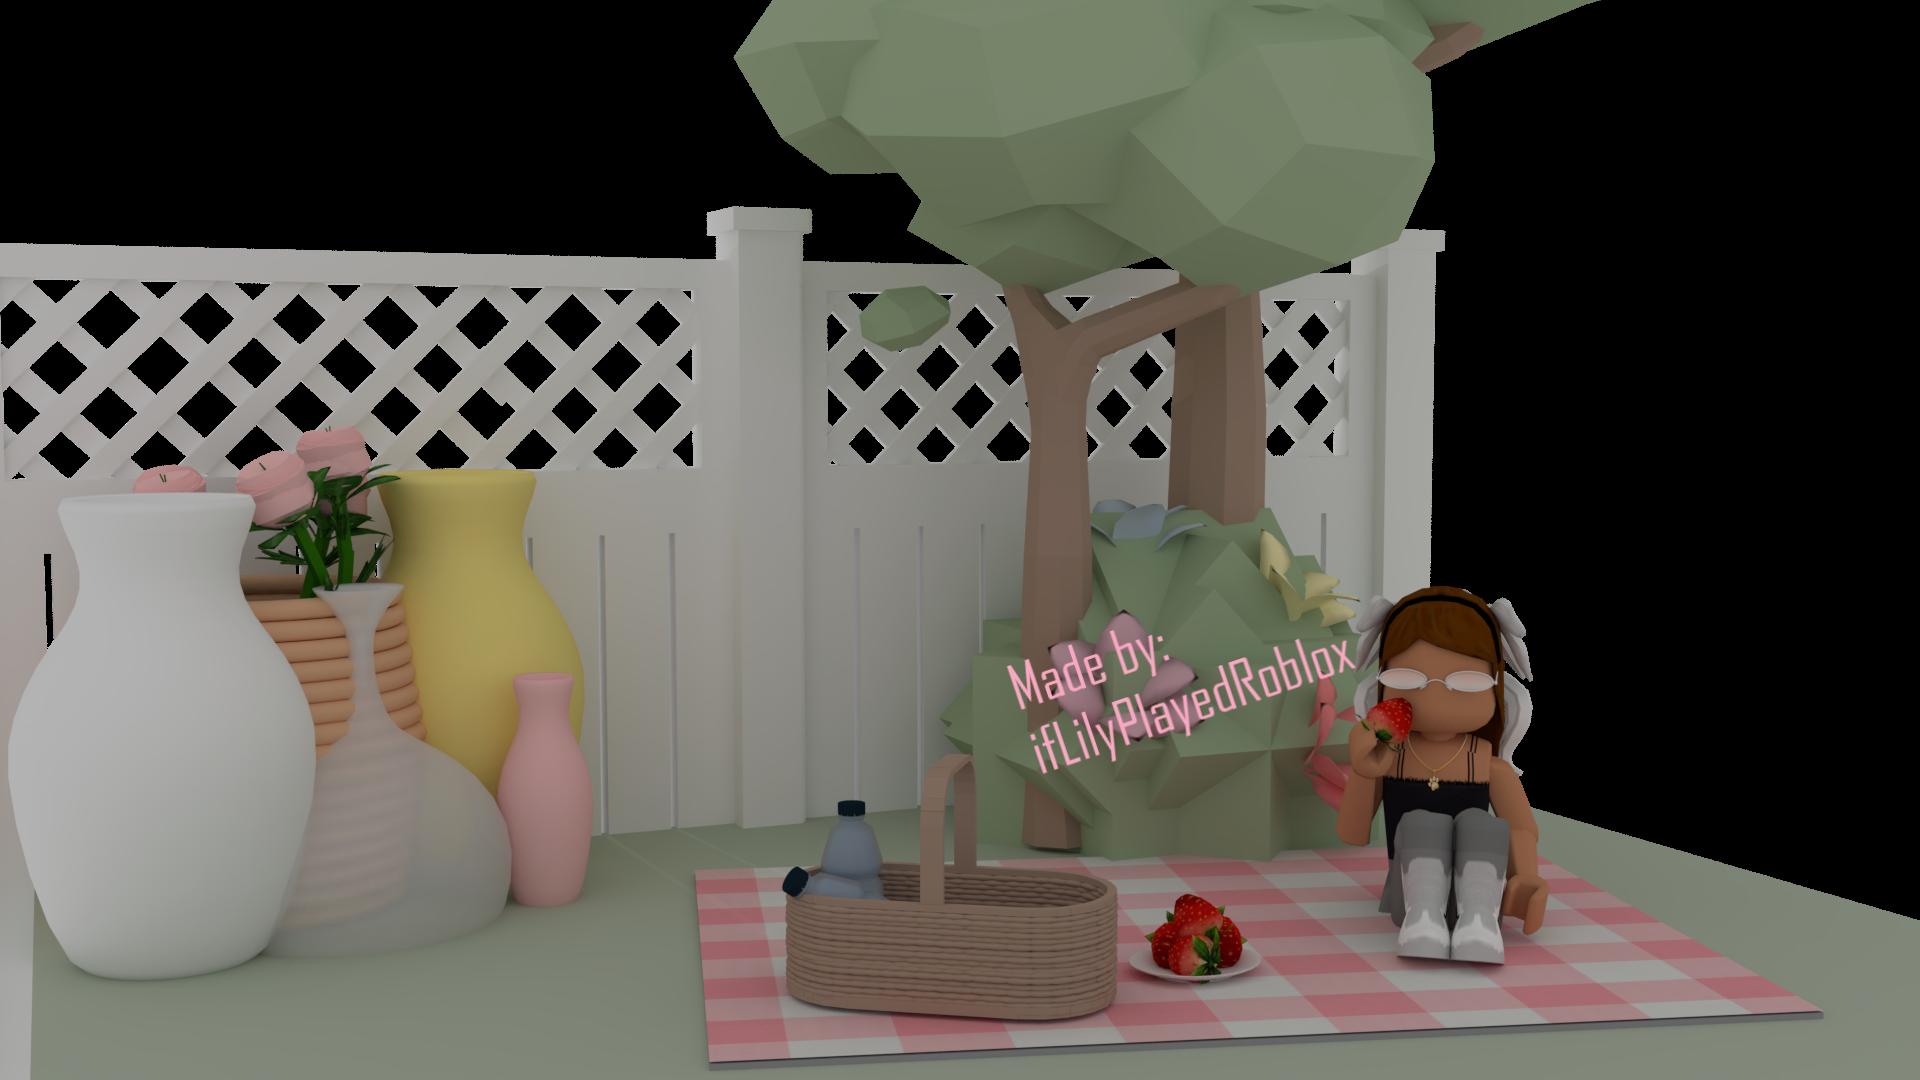 Roblox Gfx Cute Aesthetic Backyard In 2020 Cute Tumblr Wallpaper Roblox Roblox Pictures